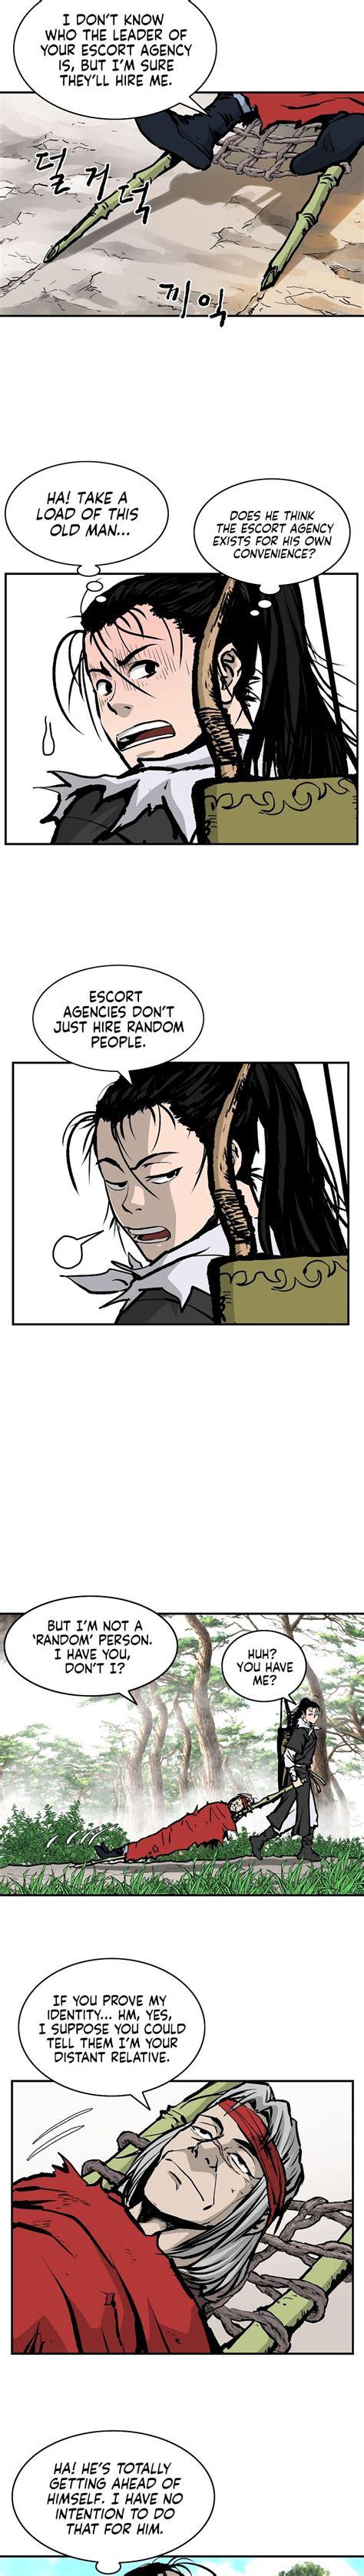 Simon's bowblade description choice weapon of simon, one of the first healing church hunters. Read Manga Bowblade Spirit - Chapter 25 - Manga Read